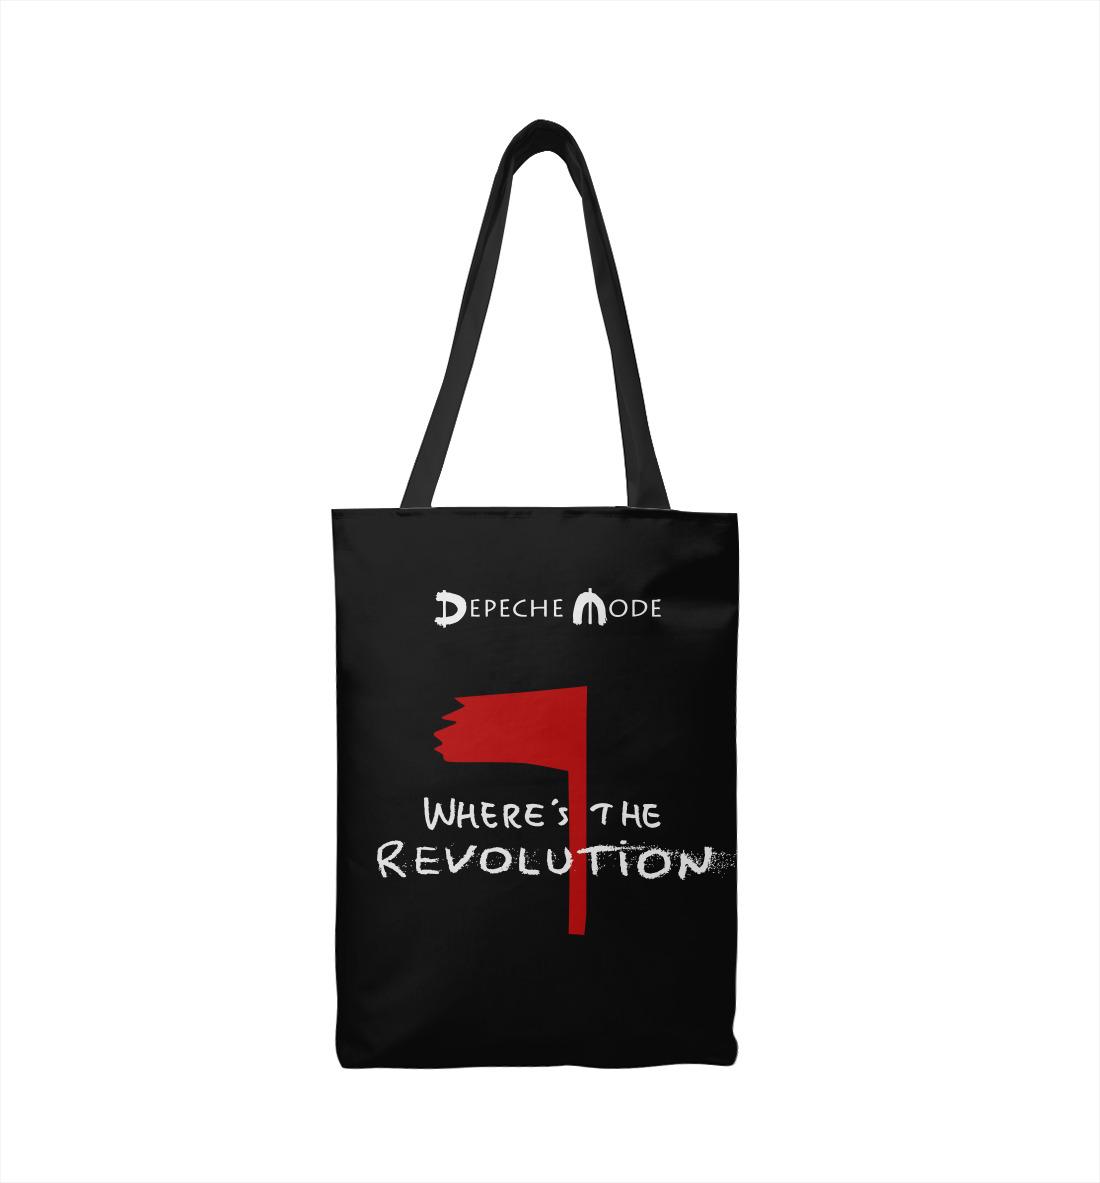 Фото - Where's the Revolution larry brendtro resilience revolution the